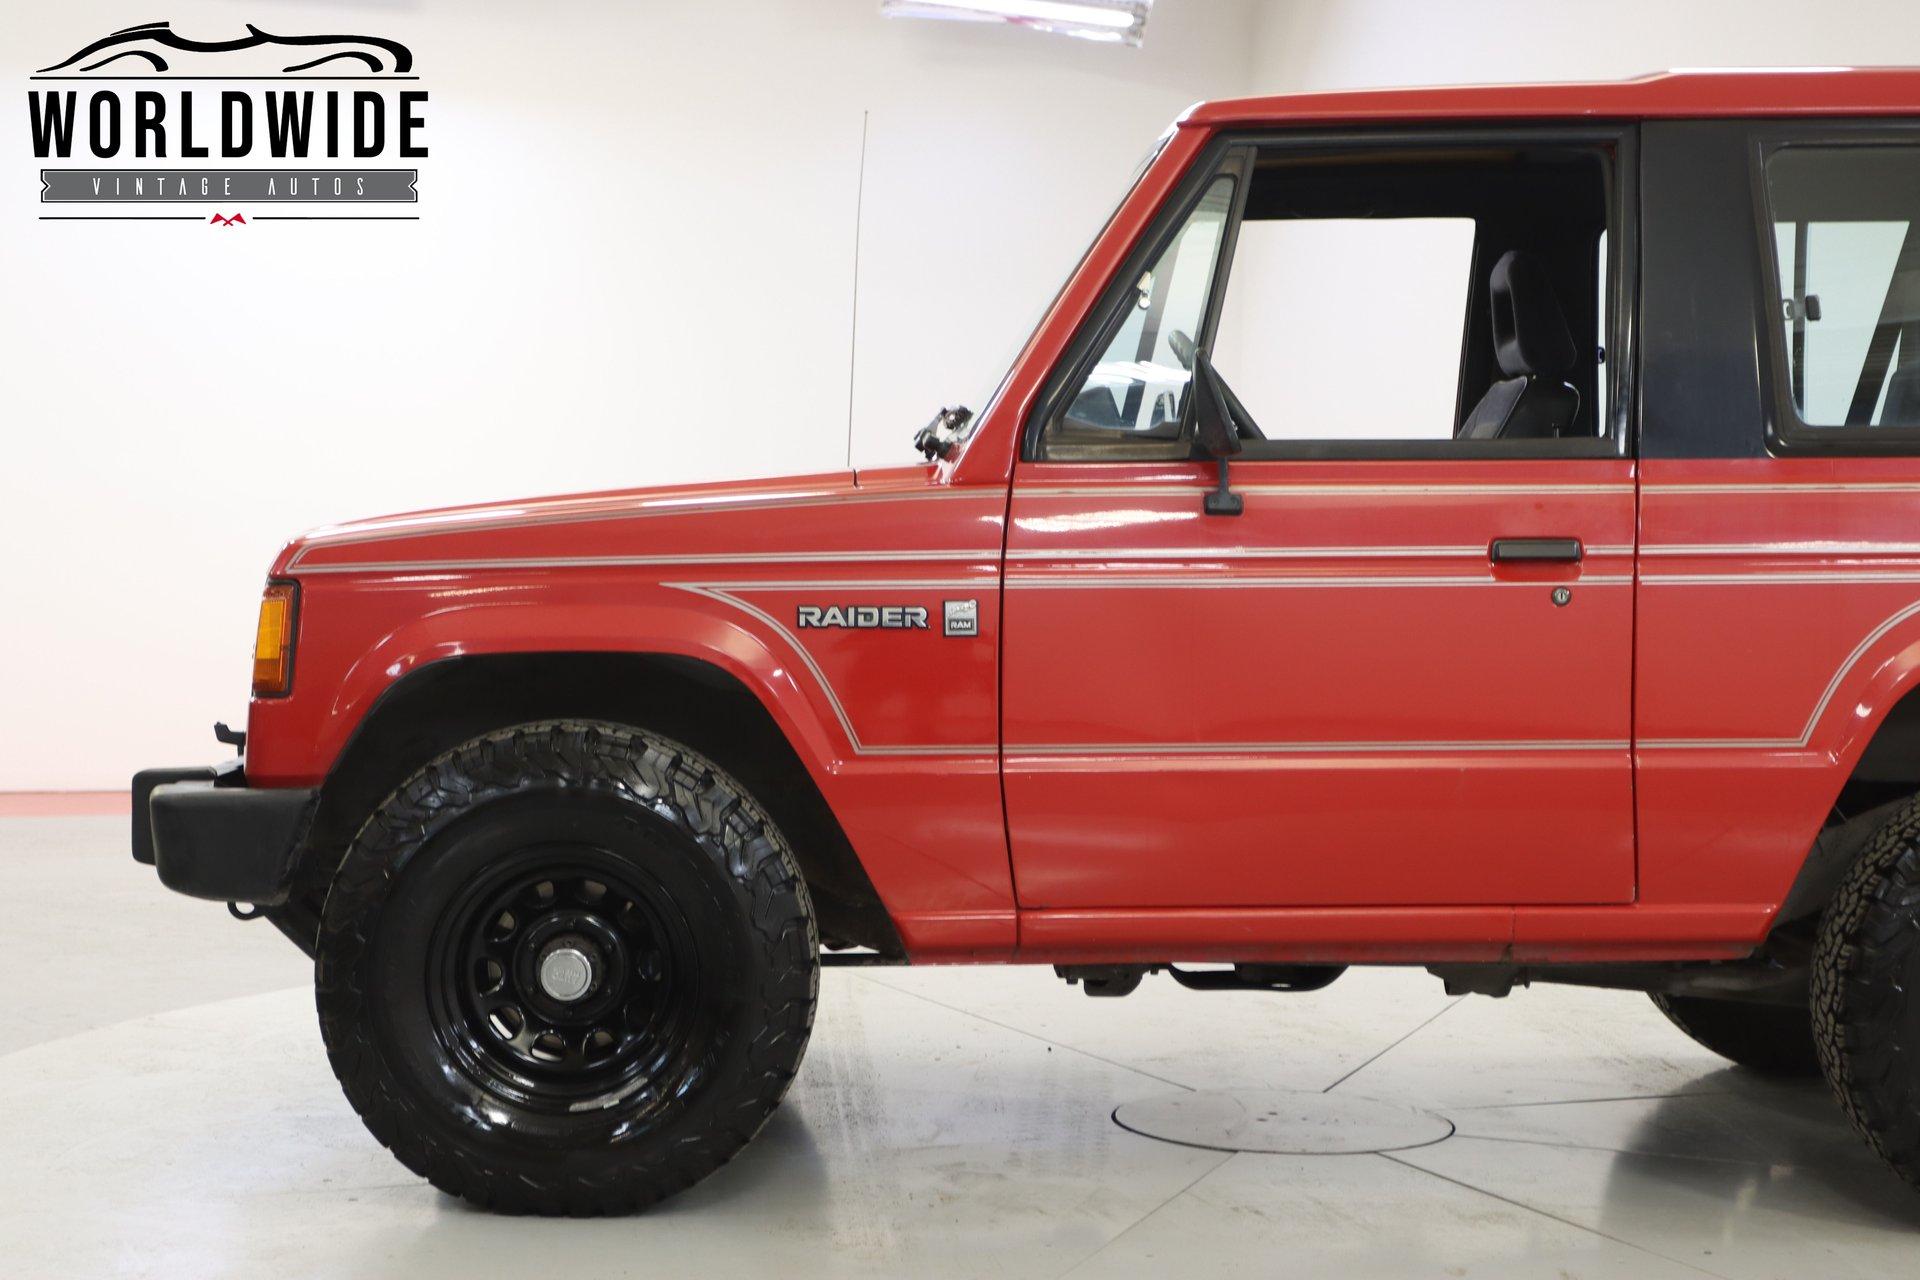 1989 Dodge RAIDER